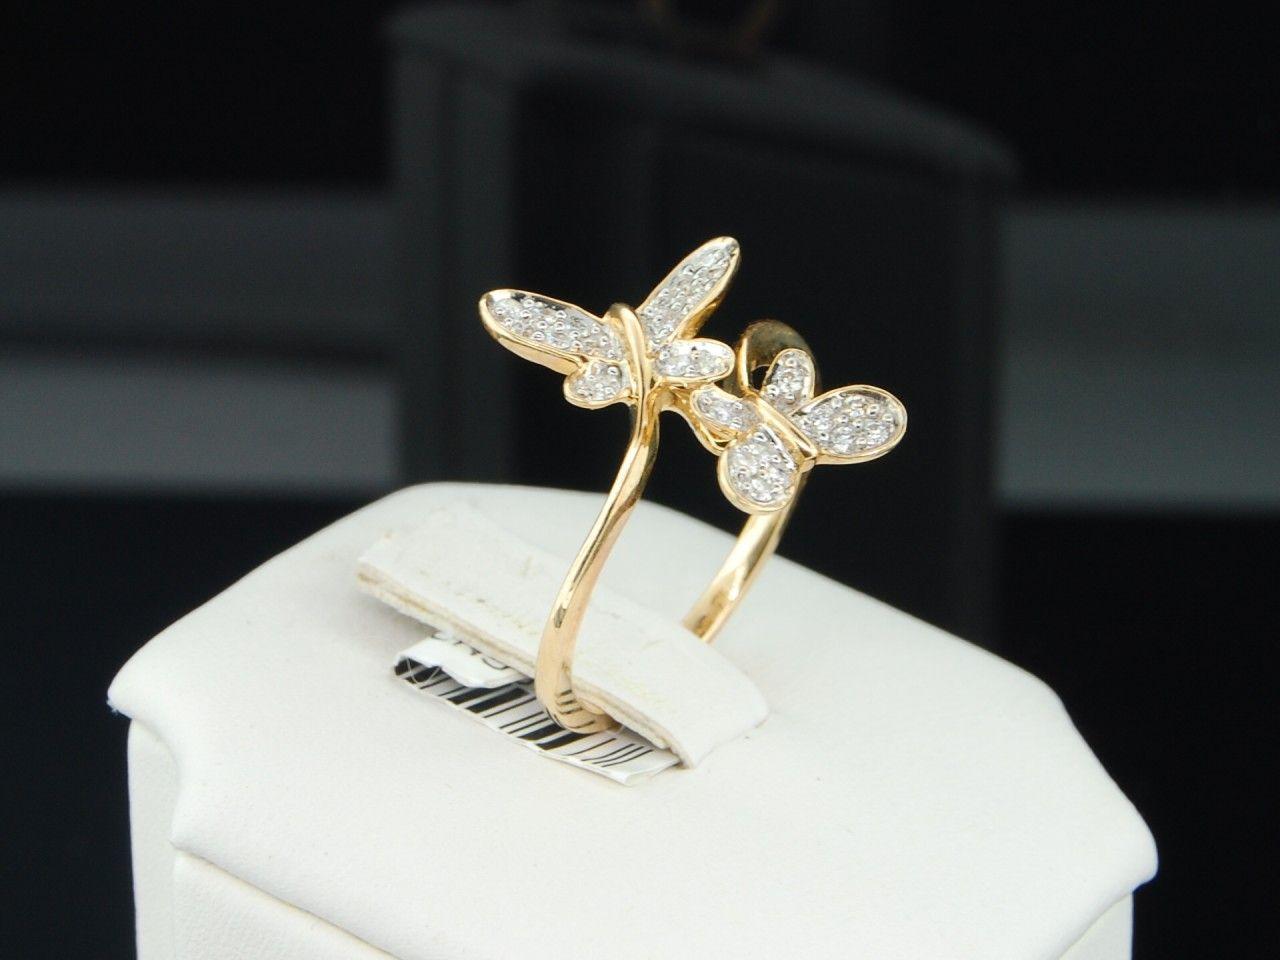 butterfly wedding rings Butterfly opal wedding ring set women WOMENS YELLOW GOLD DOUBLE BUTTERFLY DIAMOND